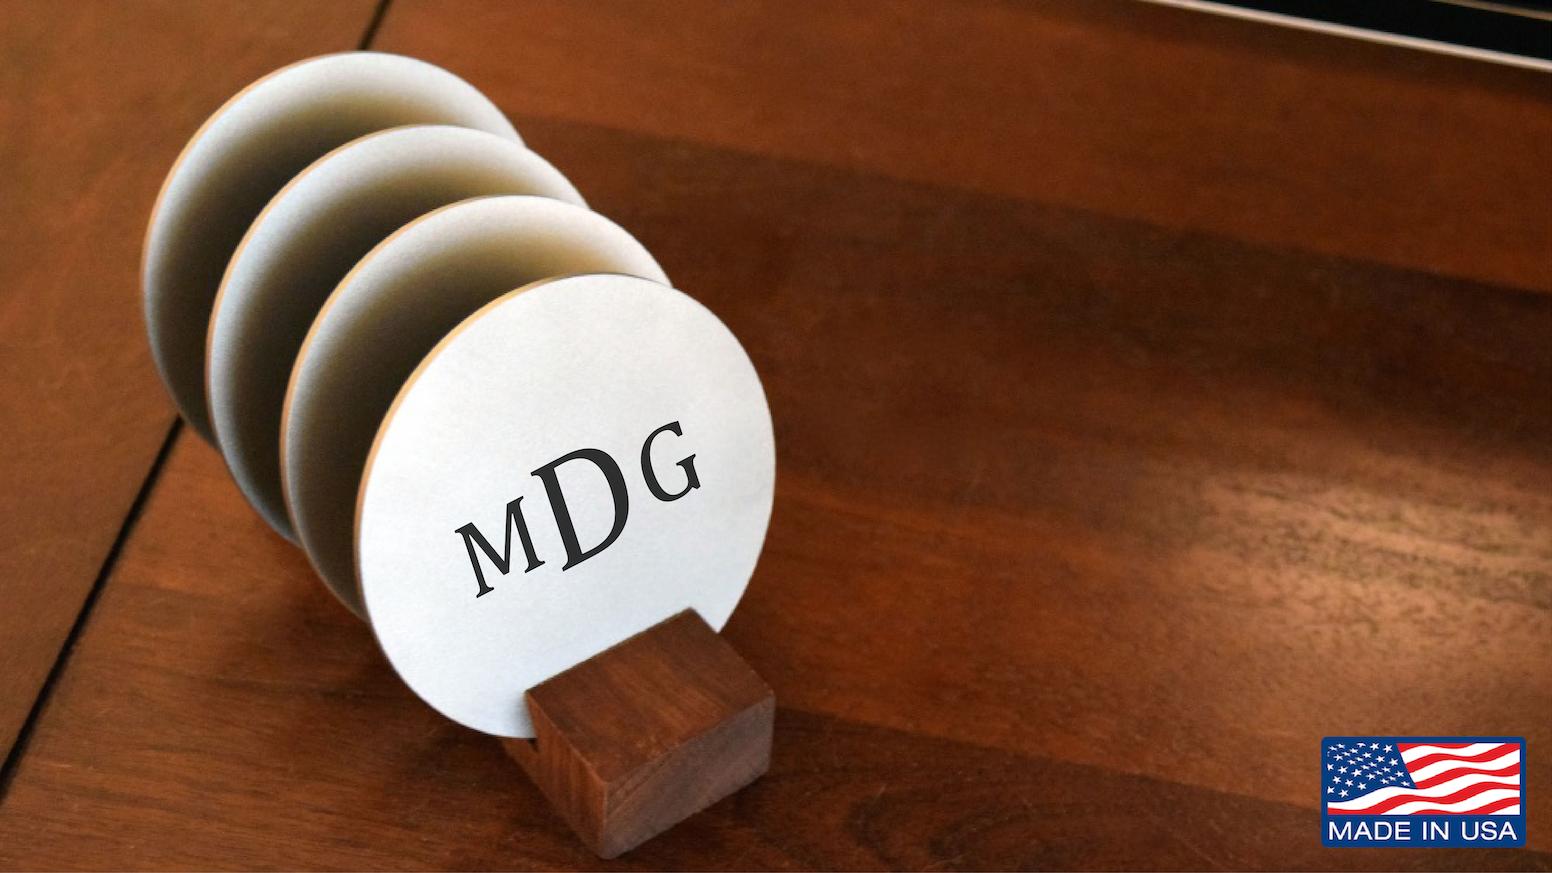 Titanium Drink Coasters - Minimal Modern Design by Taftware